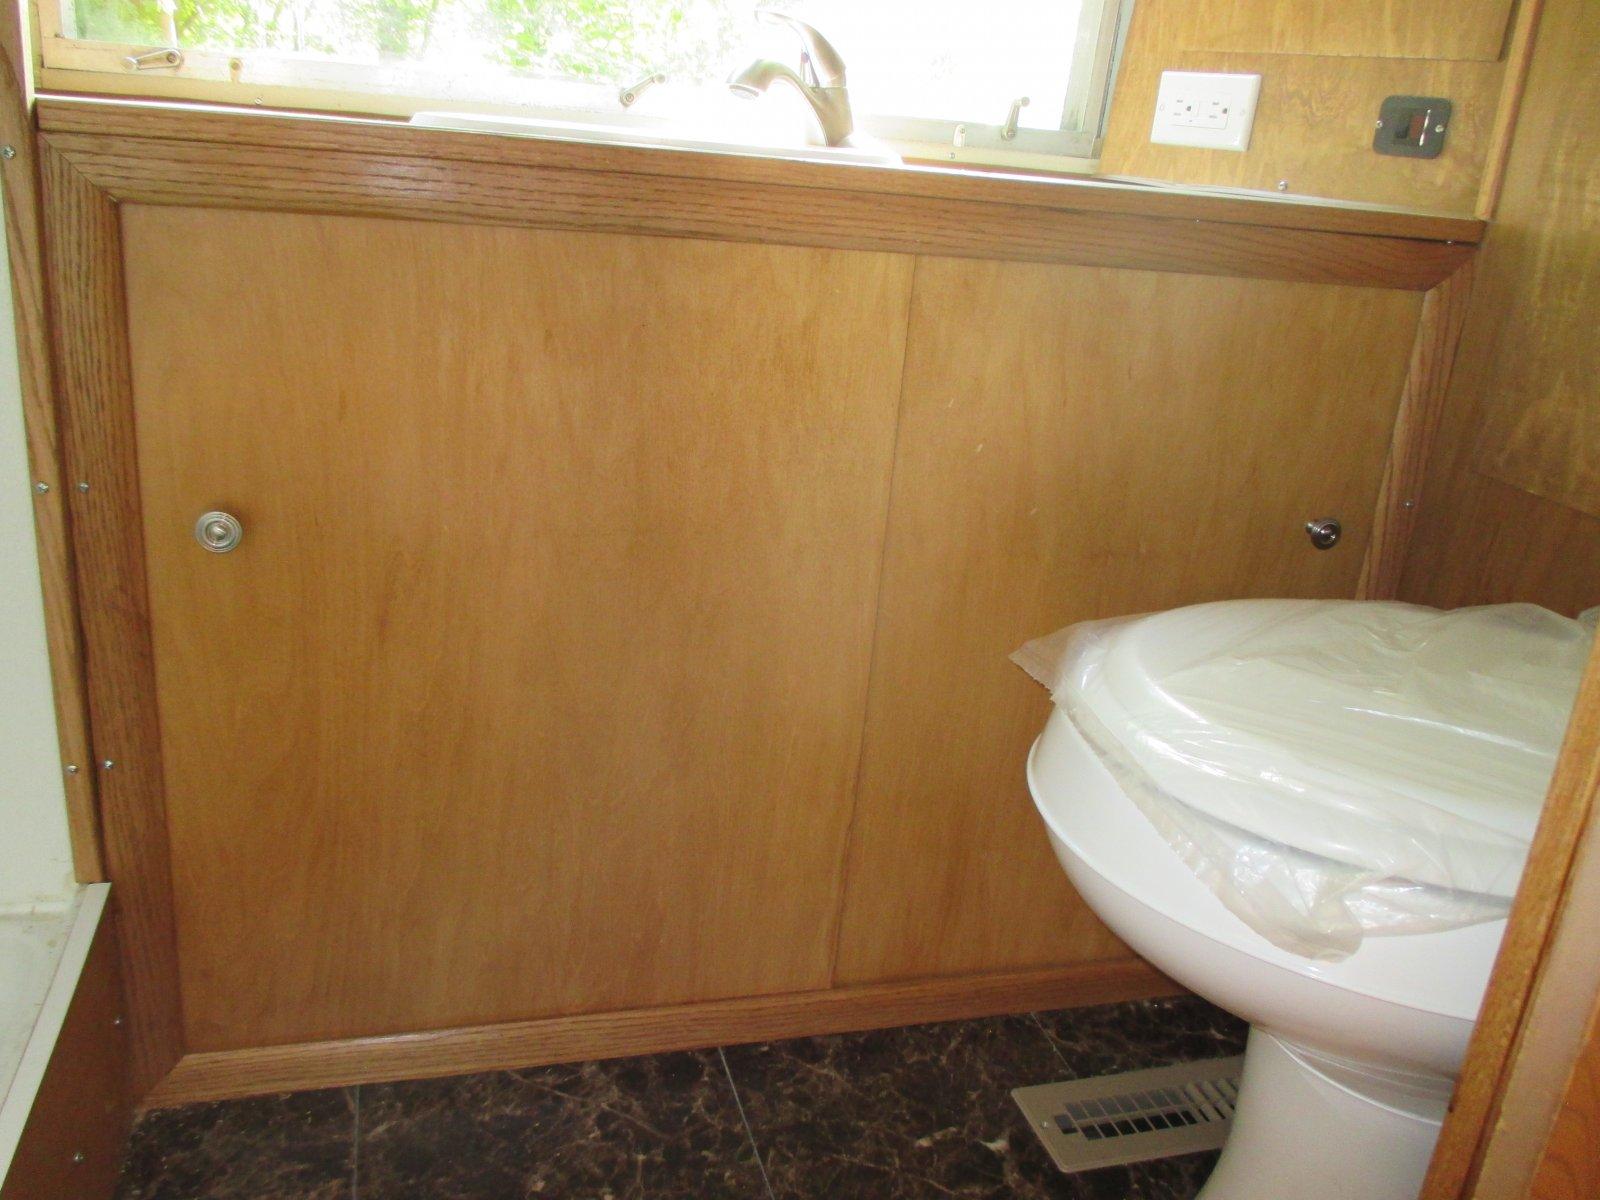 Click image for larger version  Name:1408 Bath Vanity Sliding Doors.jpg Views:50 Size:220.4 KB ID:247138